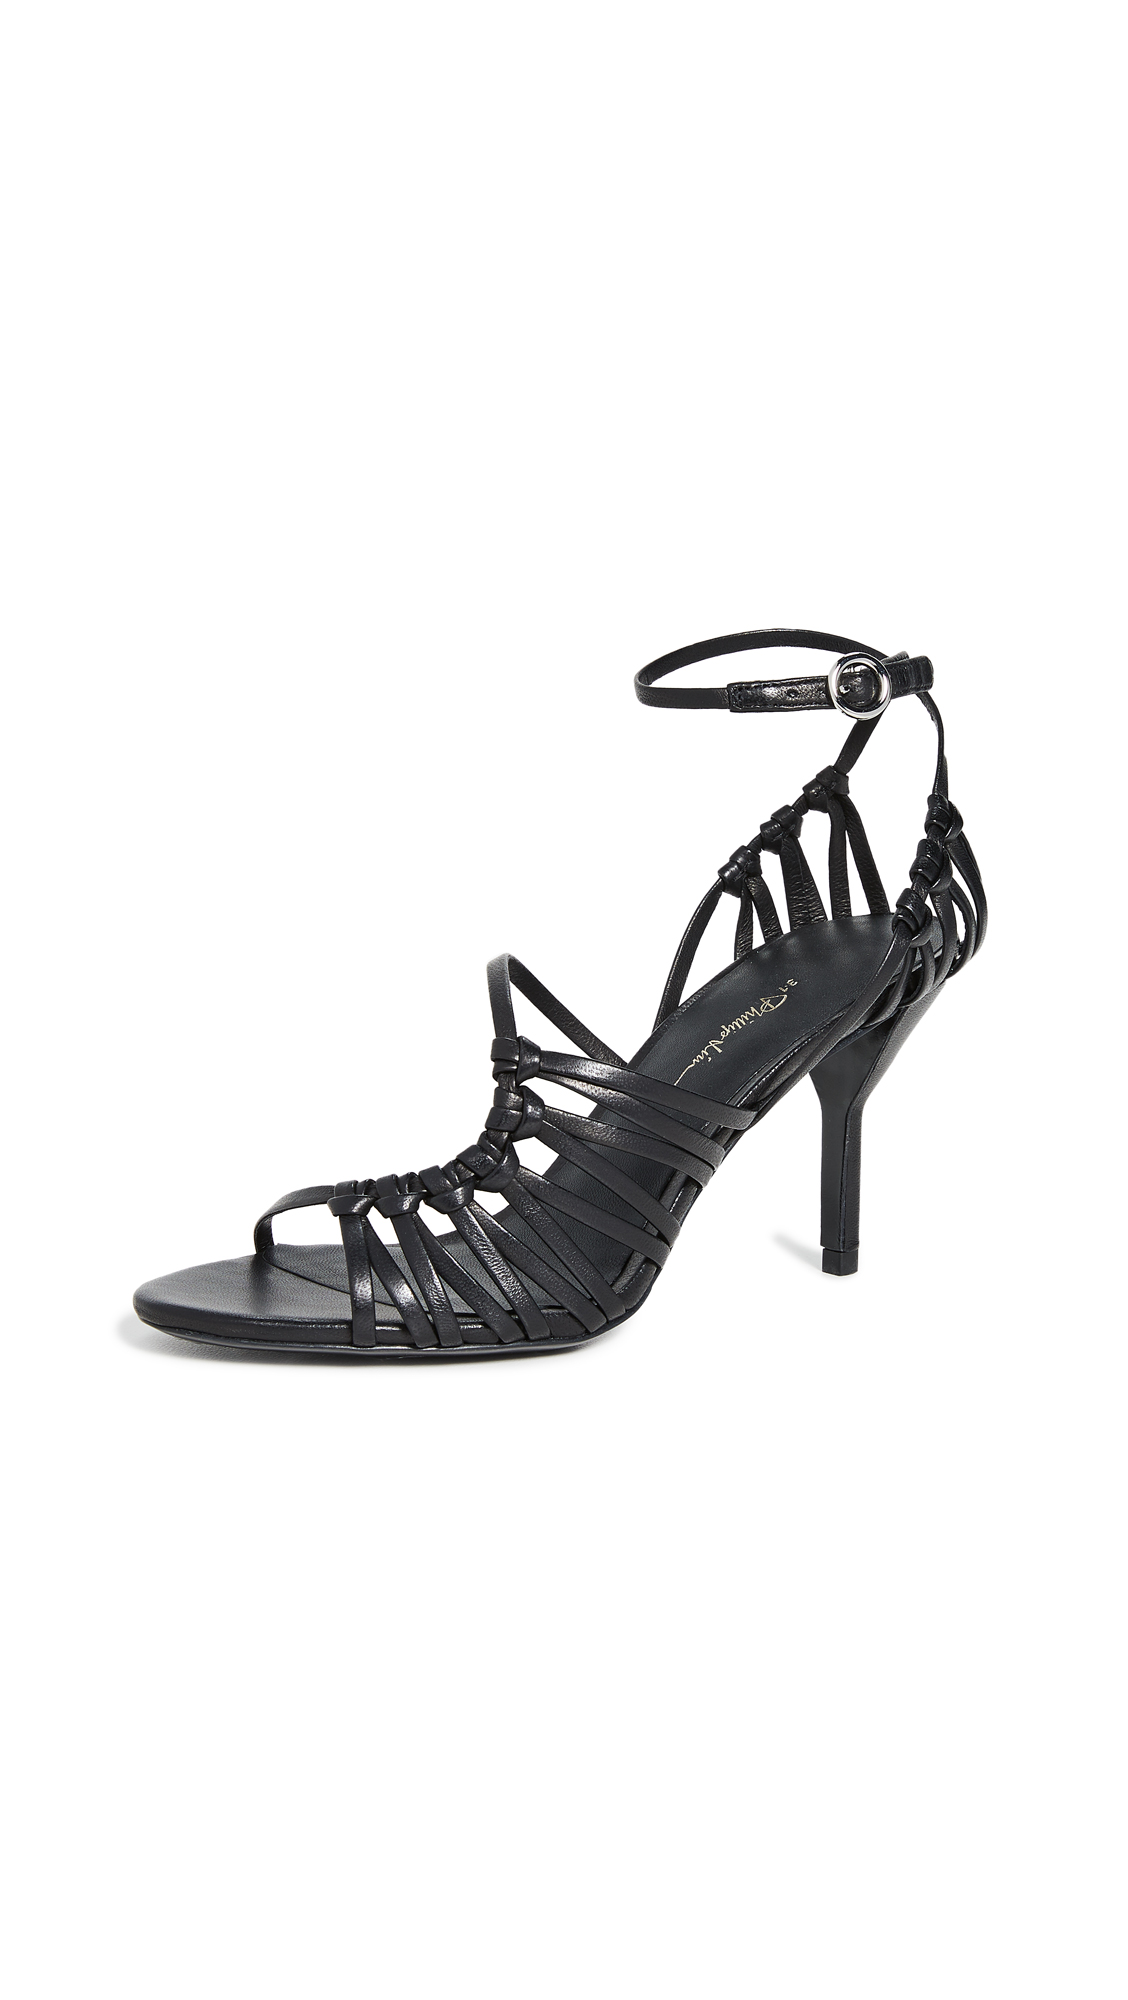 Buy 3.1 Phillip Lim 75mm Lily Strappy Sandals online, shop 3.1 Phillip Lim